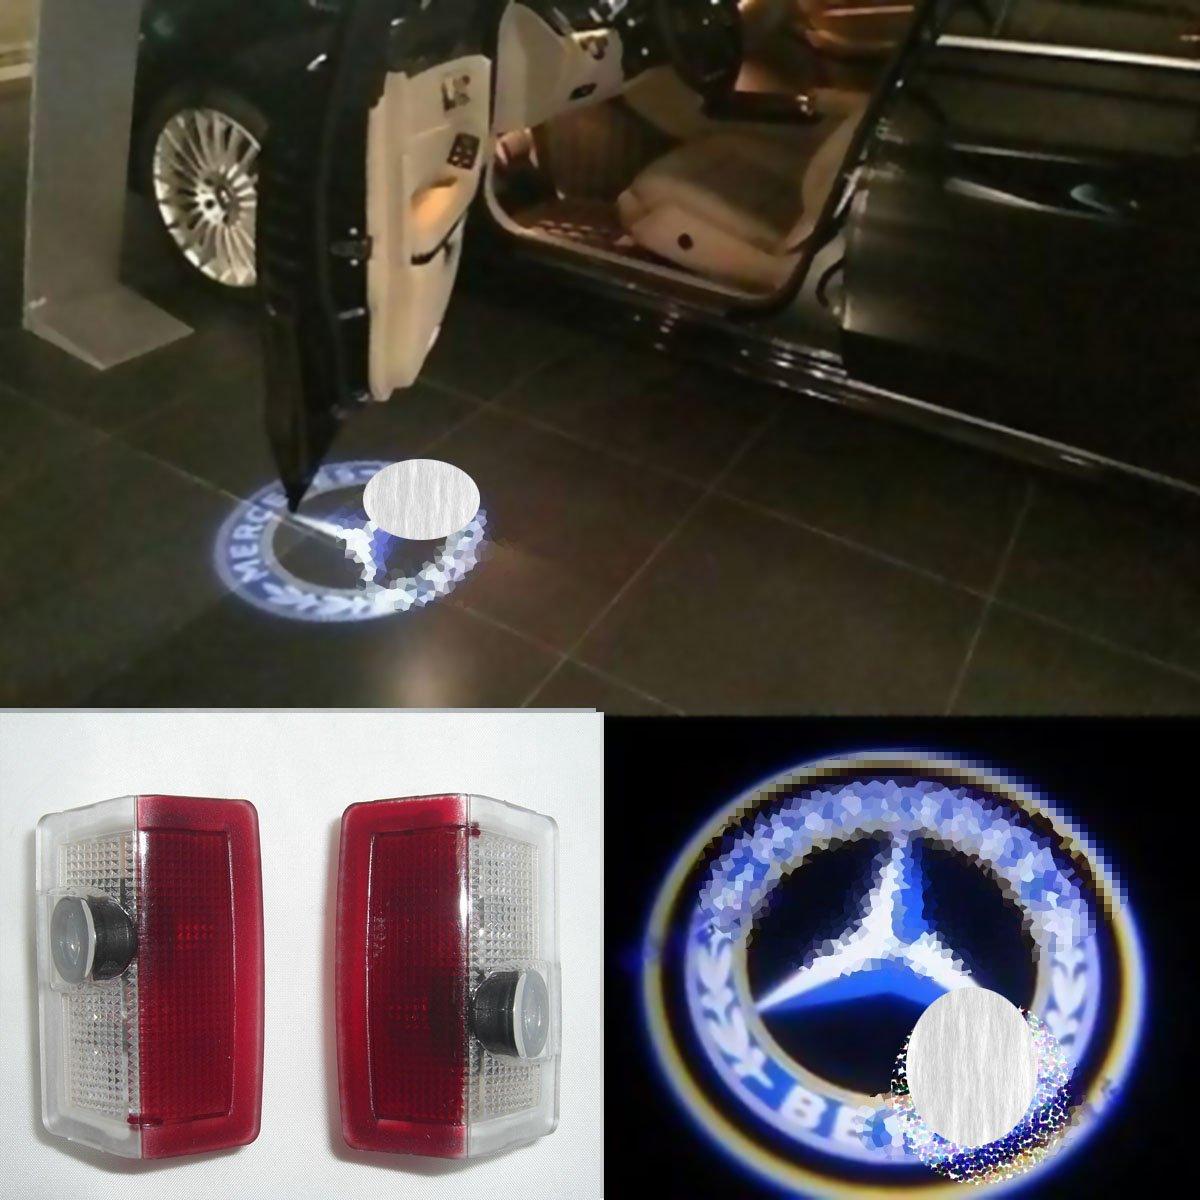 2X LED Door Step Courtesy Light Welcome Light Laser Shadow Logo Projector For Benz X166 GL350 GL400 GL500 GL63 AMG X156 GLA180 GLA200 X253 GLC220 GLC250 GLC300 CNAutoLicht #1